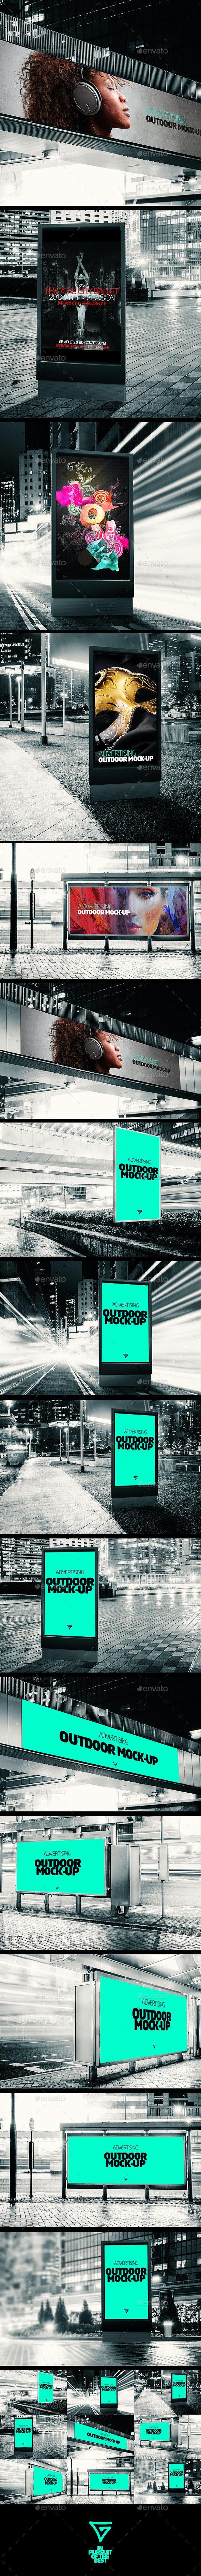 Outdoor Banner Advertising Mock-ups - Signage Print